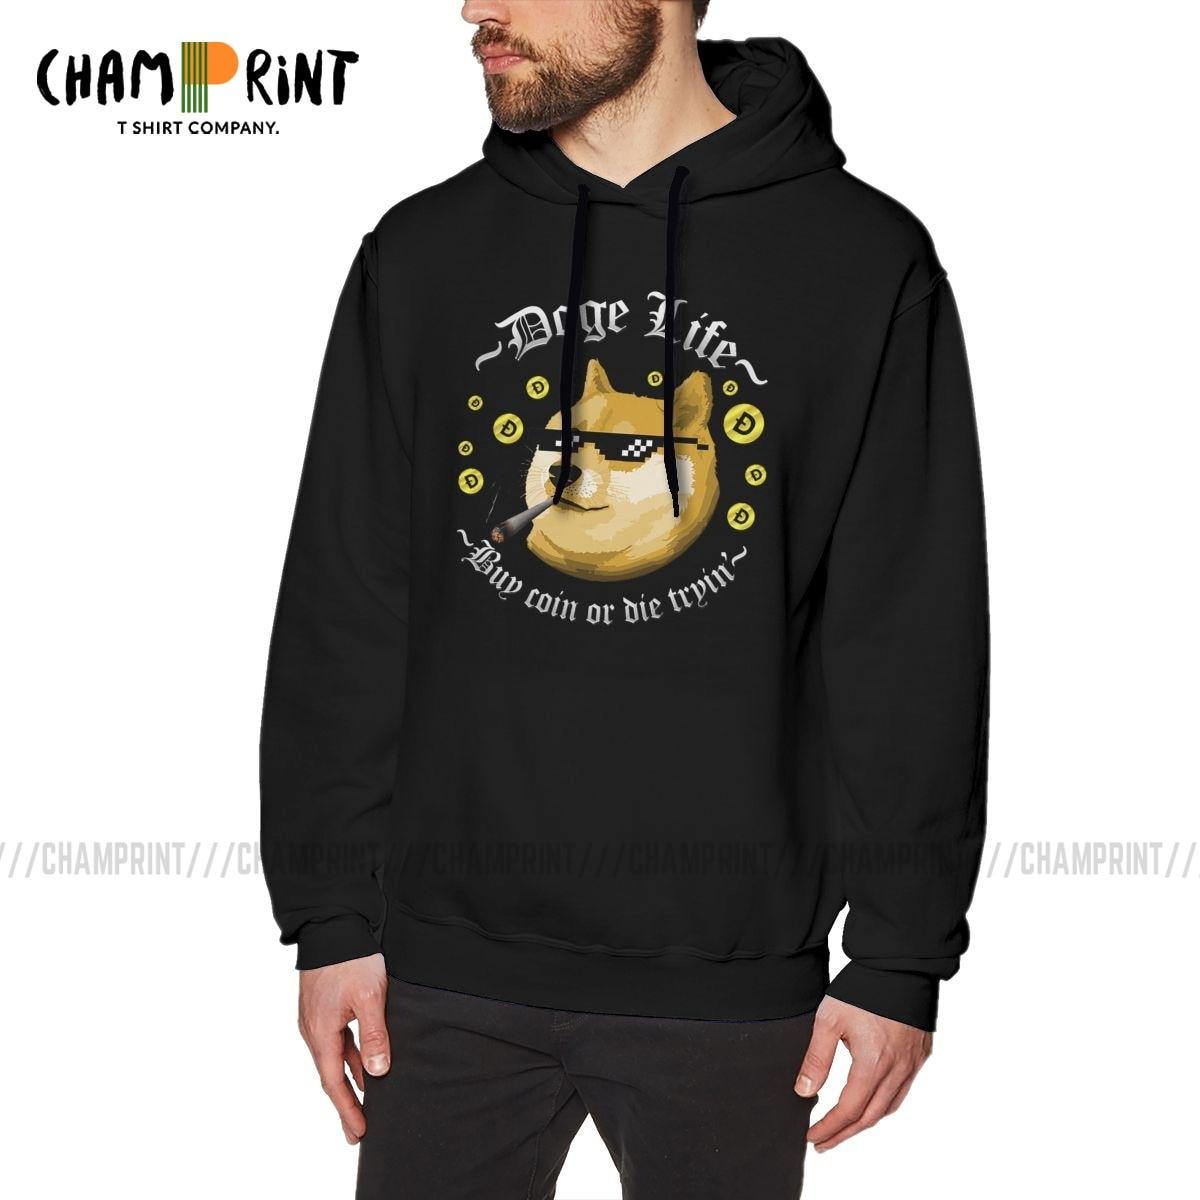 Vintage Style Hoodies Men's Doge Life Dogecoin Cotton Bitcoin Crypto Cryptocurrency Ethereum Btc Blockchain Hooded Sweatshirts 1